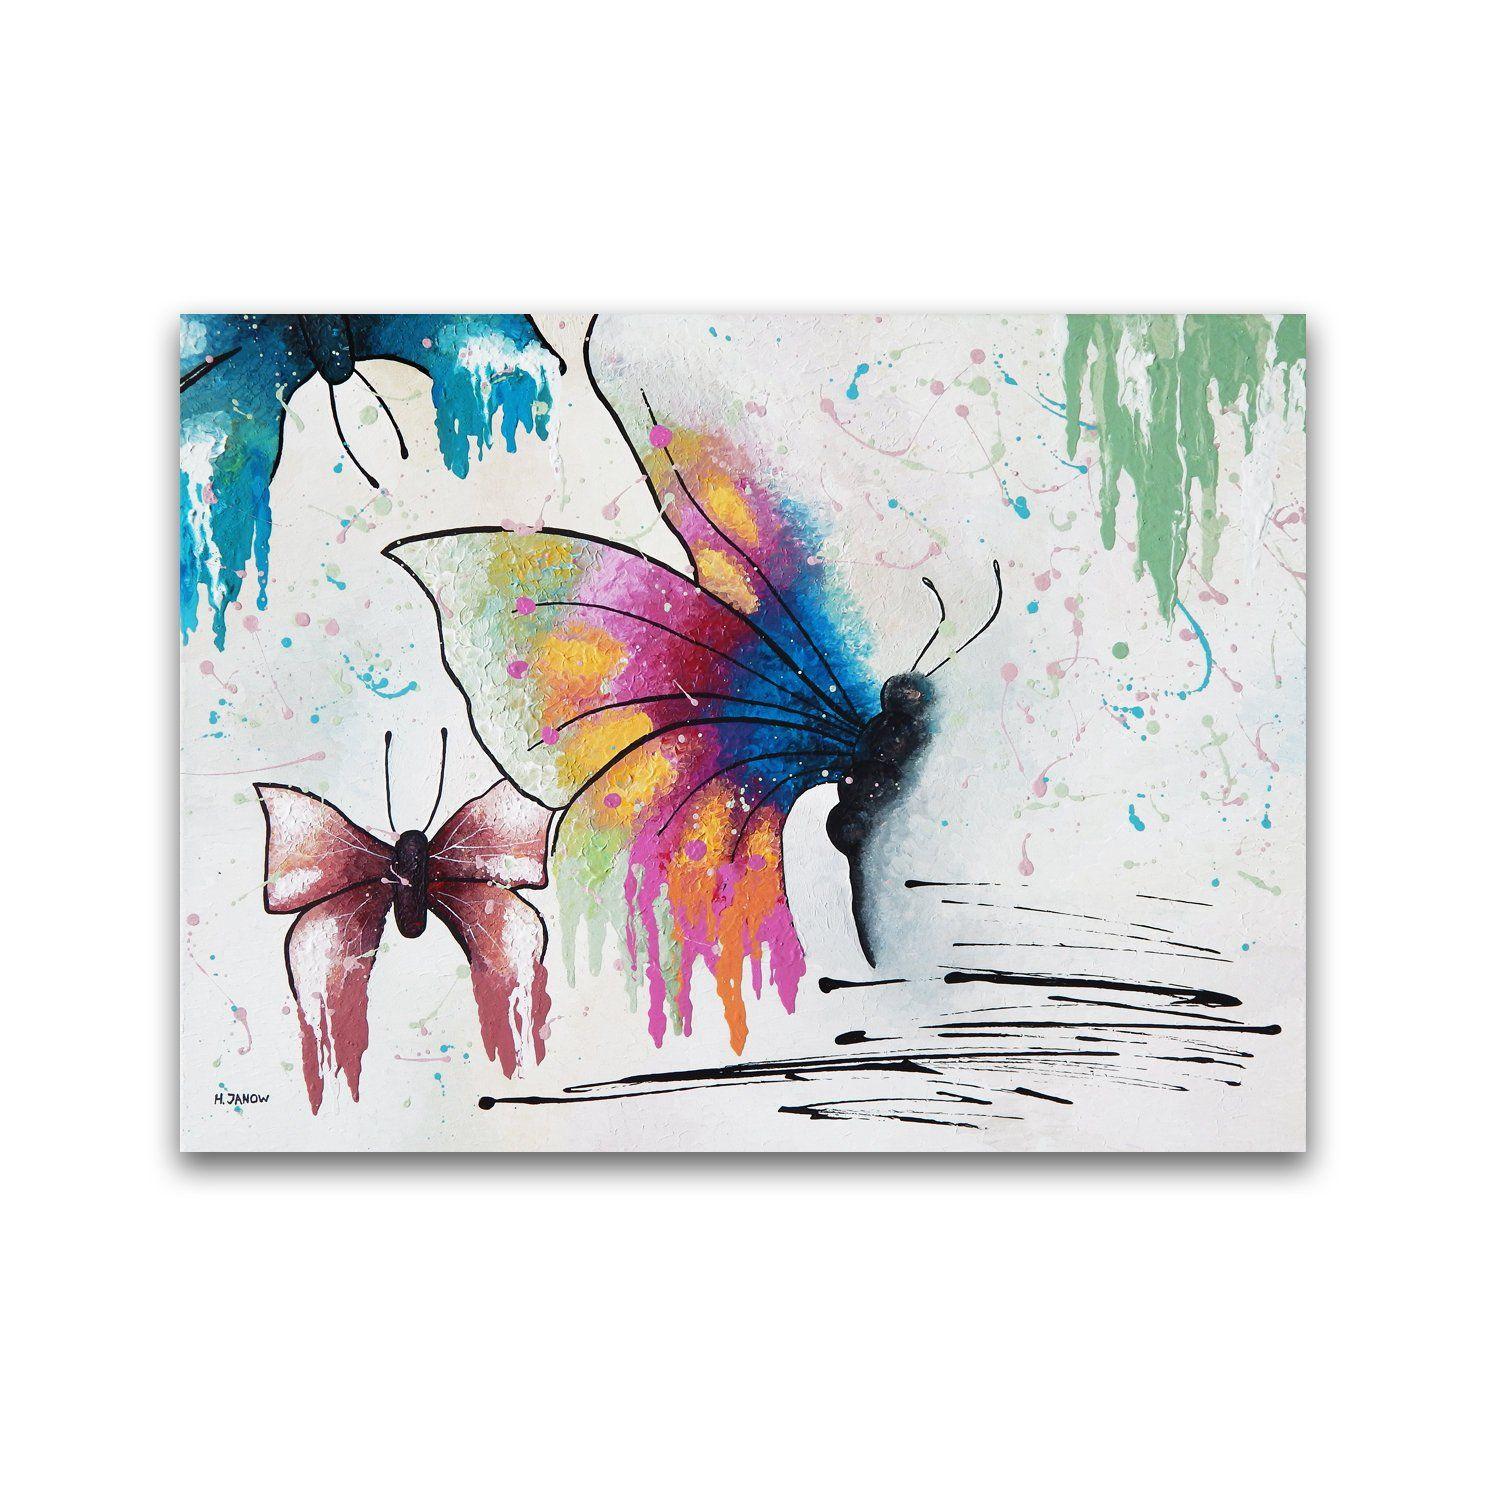 Spring Decor Butterfly Painting Original Painting On Canvas Acrylic Pour Painting Fluid Art Colorful W Butterfly Painting Acrylic Painting Canvas Fluid Art